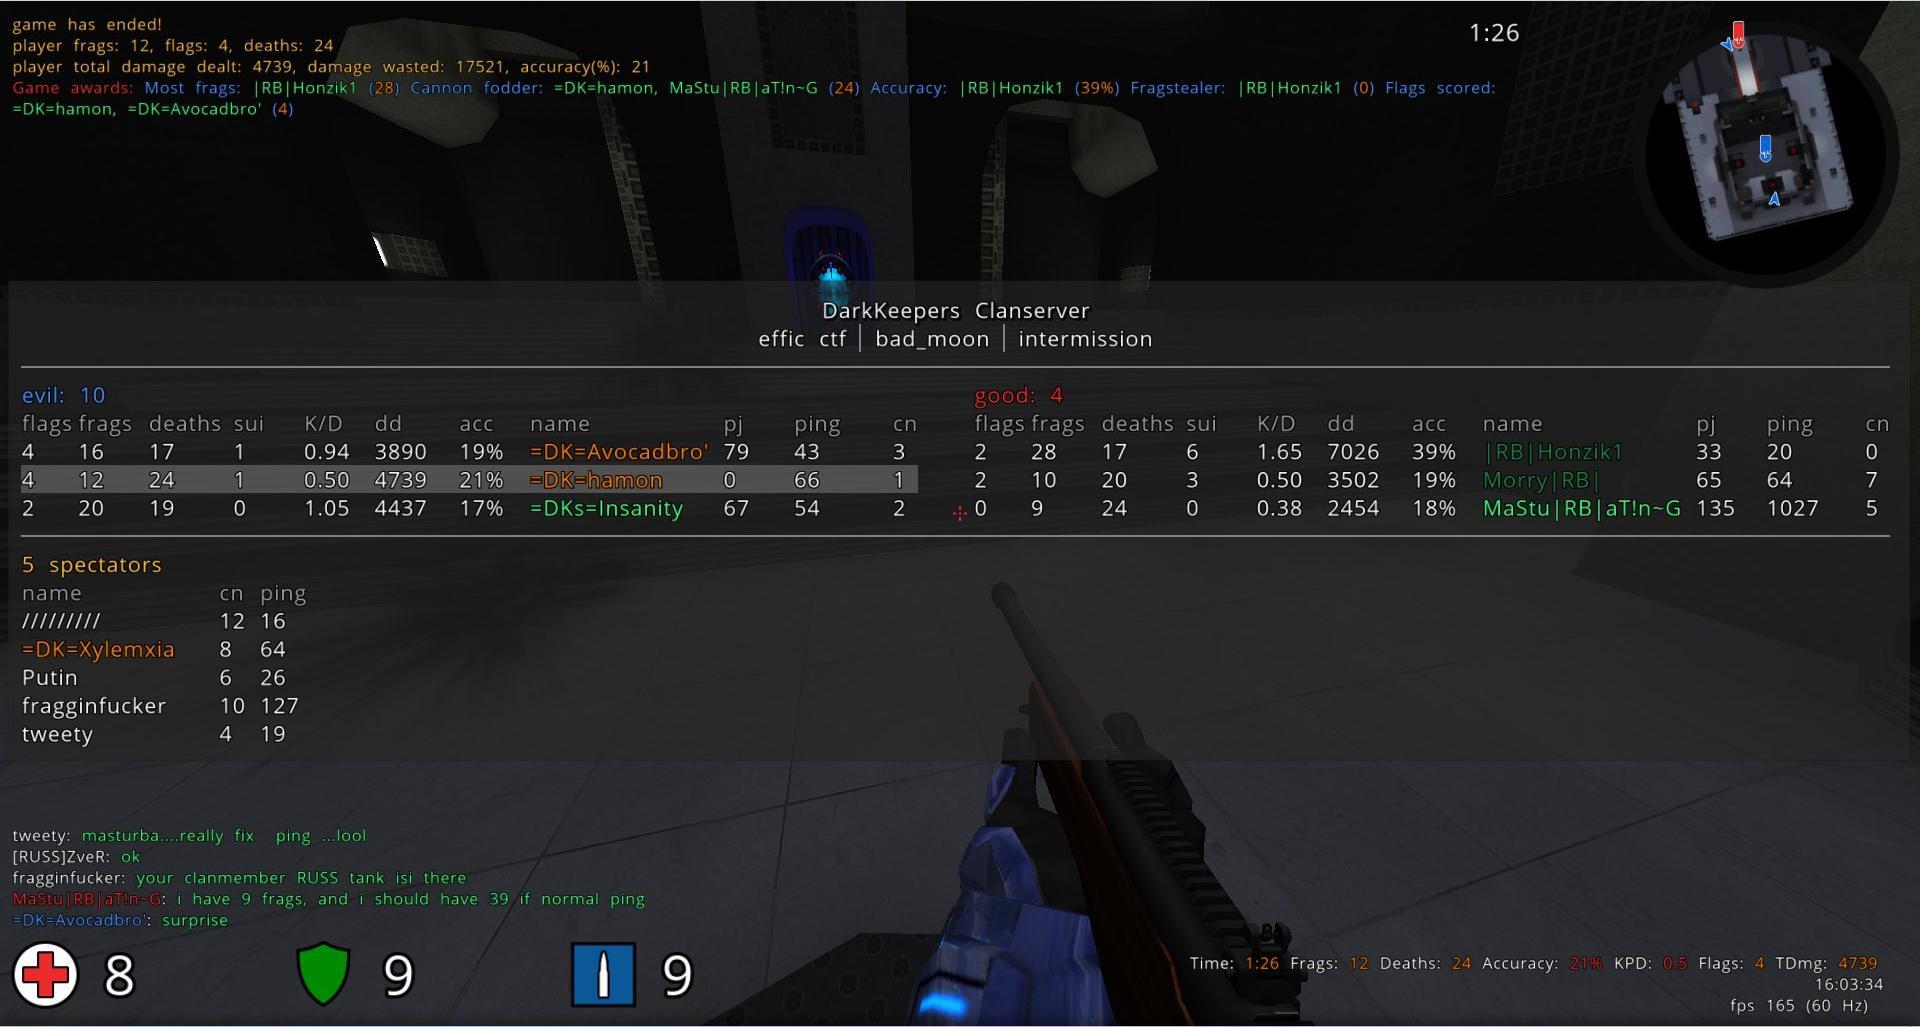 https://darkkeepers.dk/images/squadmanagement/warscreenshots/thumbs/2016_04_24_DK_vs_RB_efficctf_bad_moon.jpeg